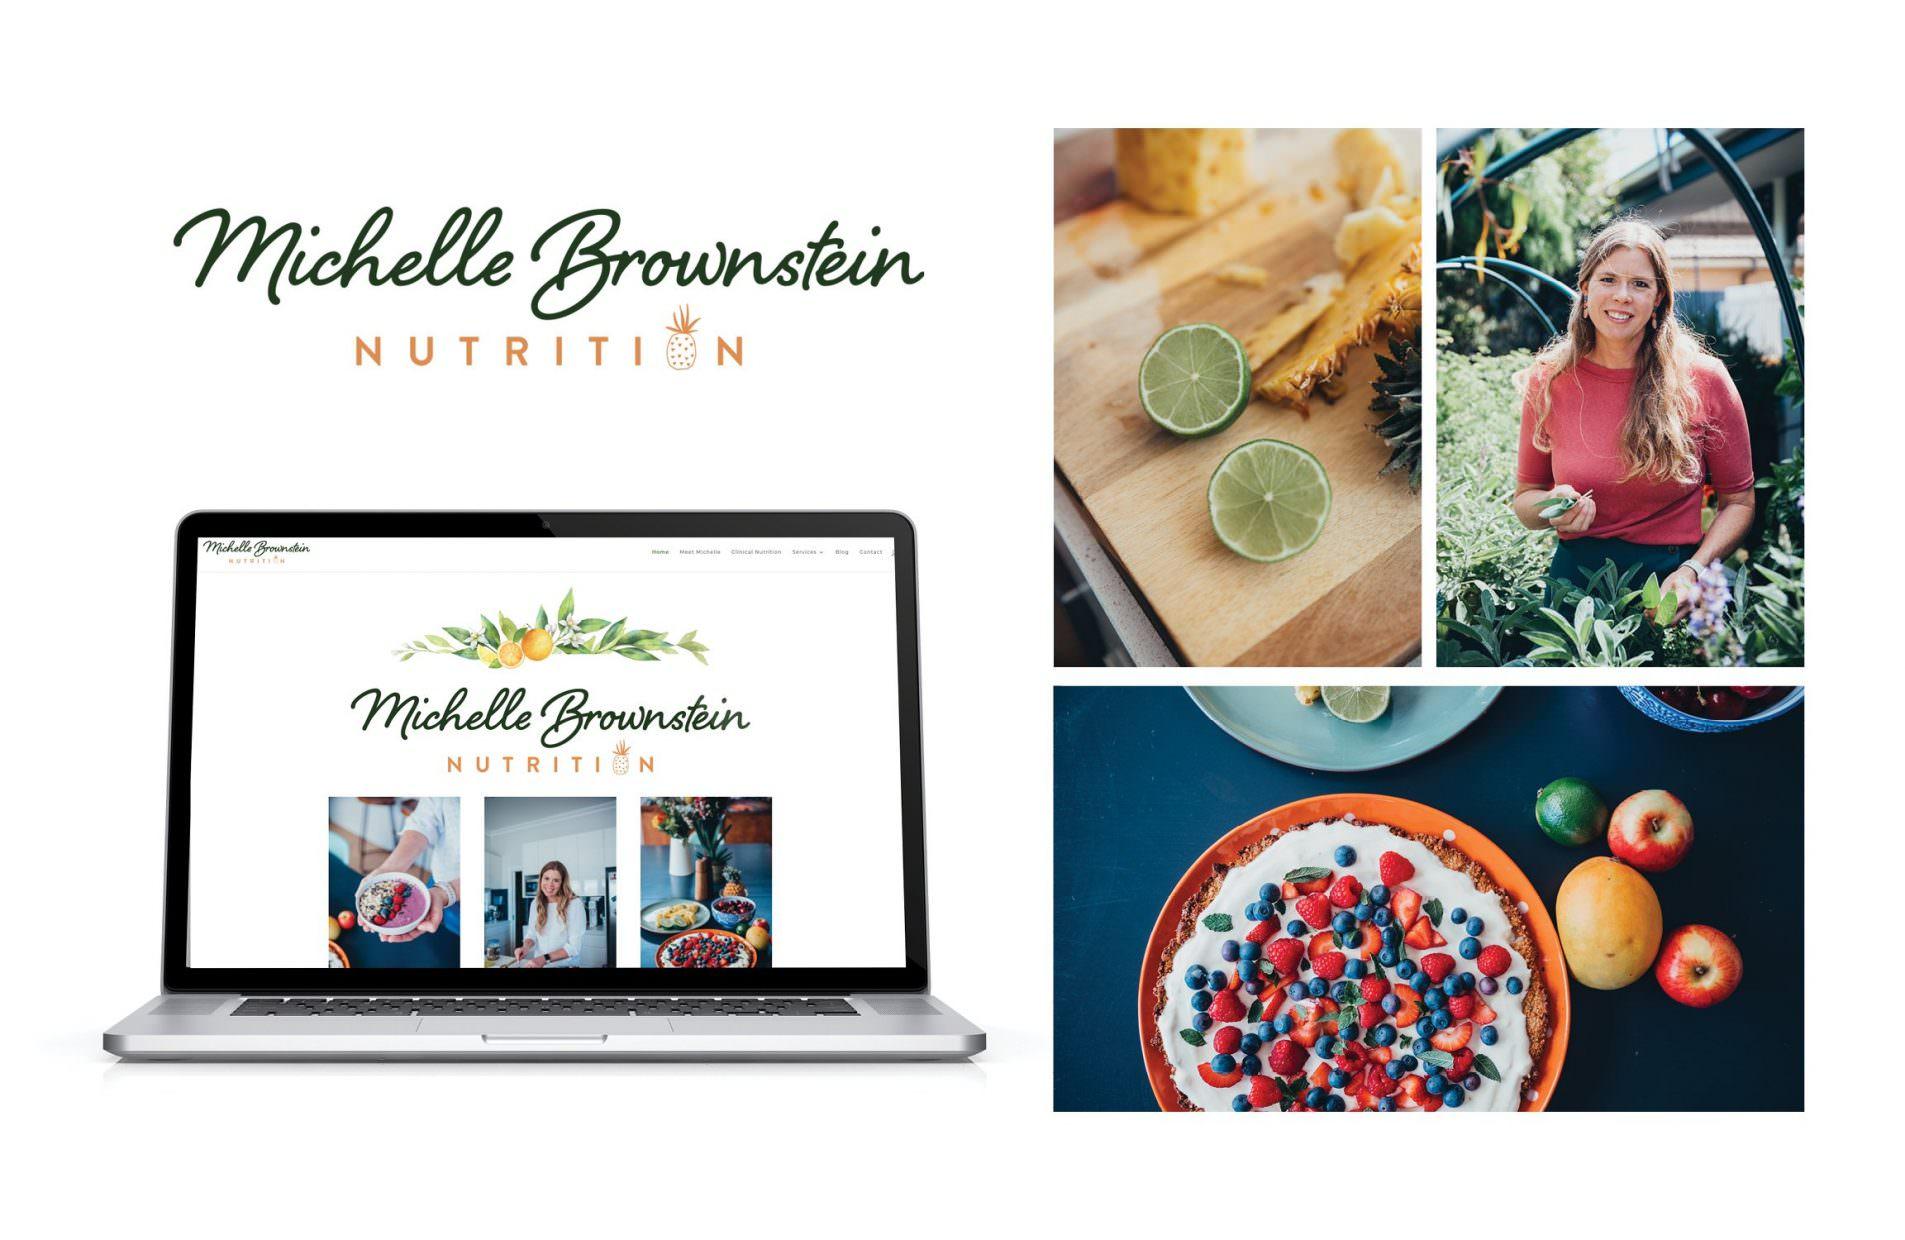 nutritionist branding laptop food shots